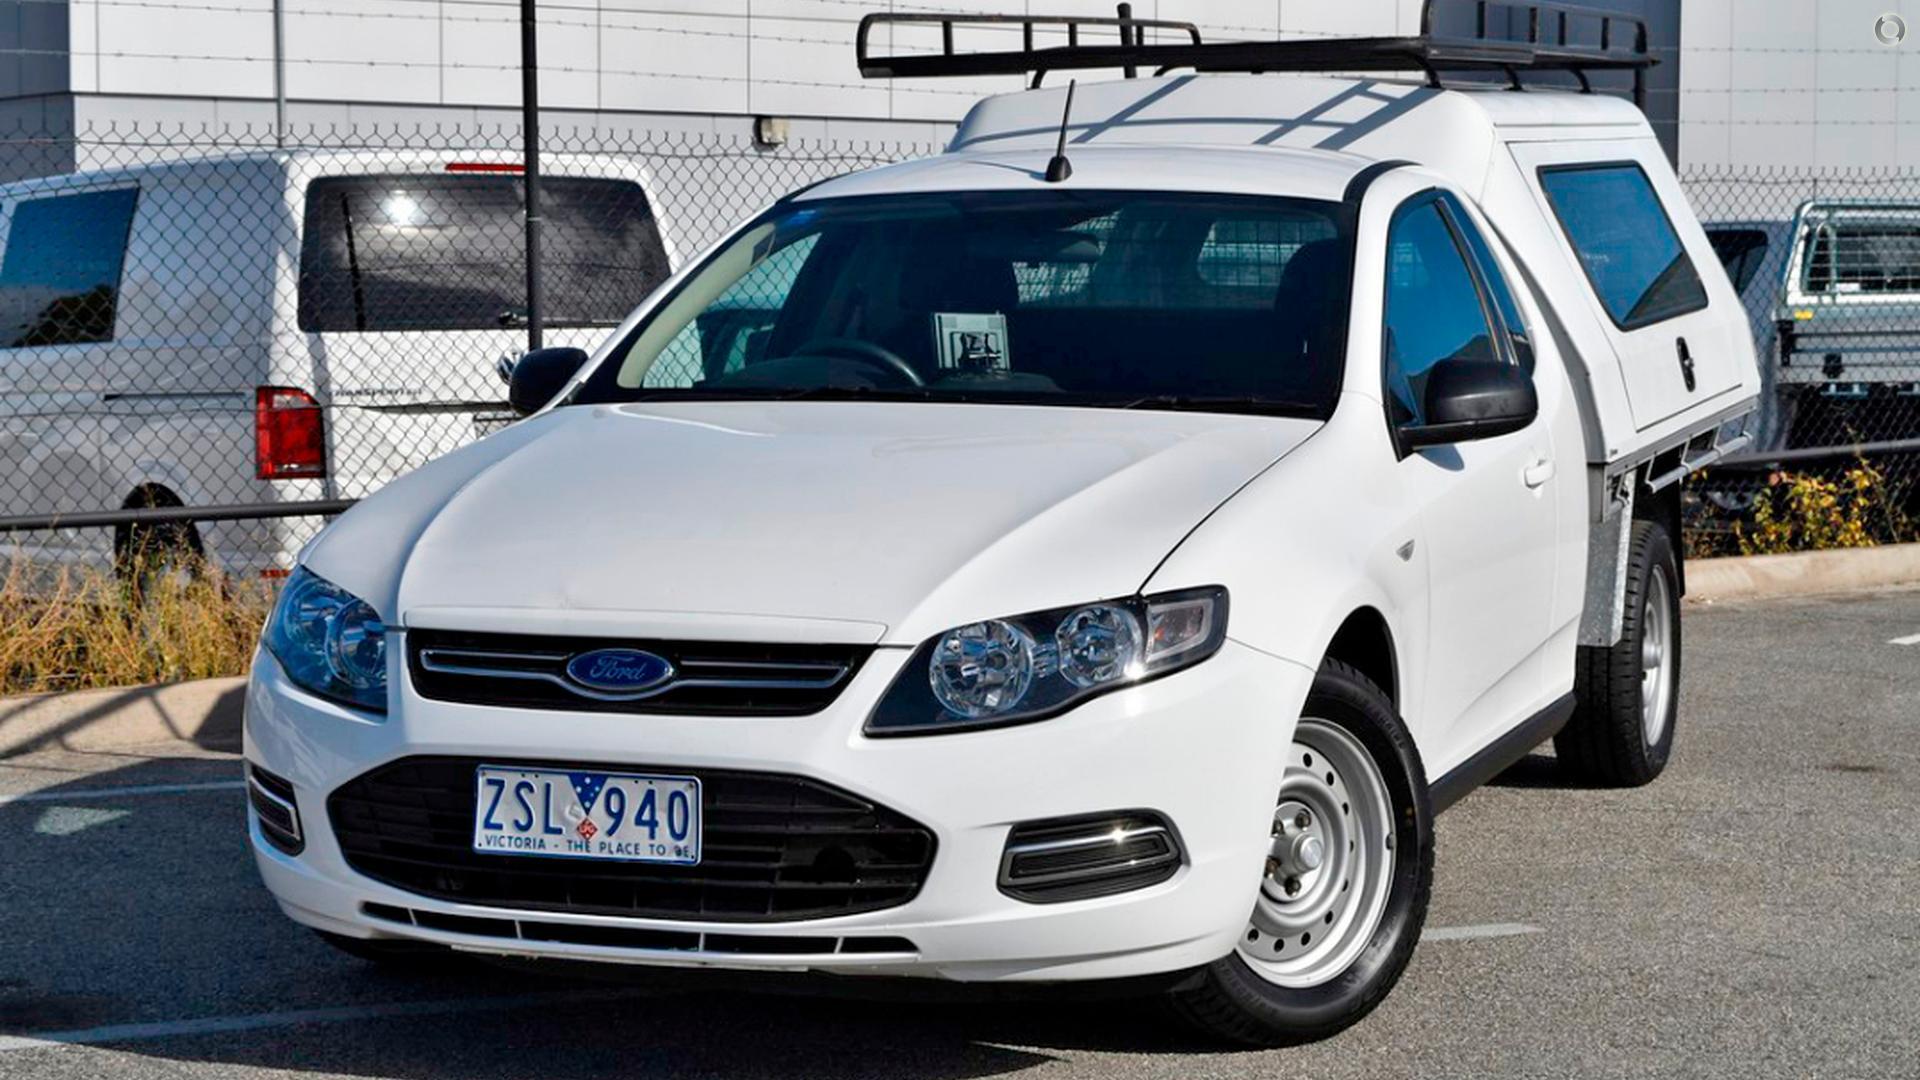 2013 Ford Falcon Ute EcoLPi FG MkII